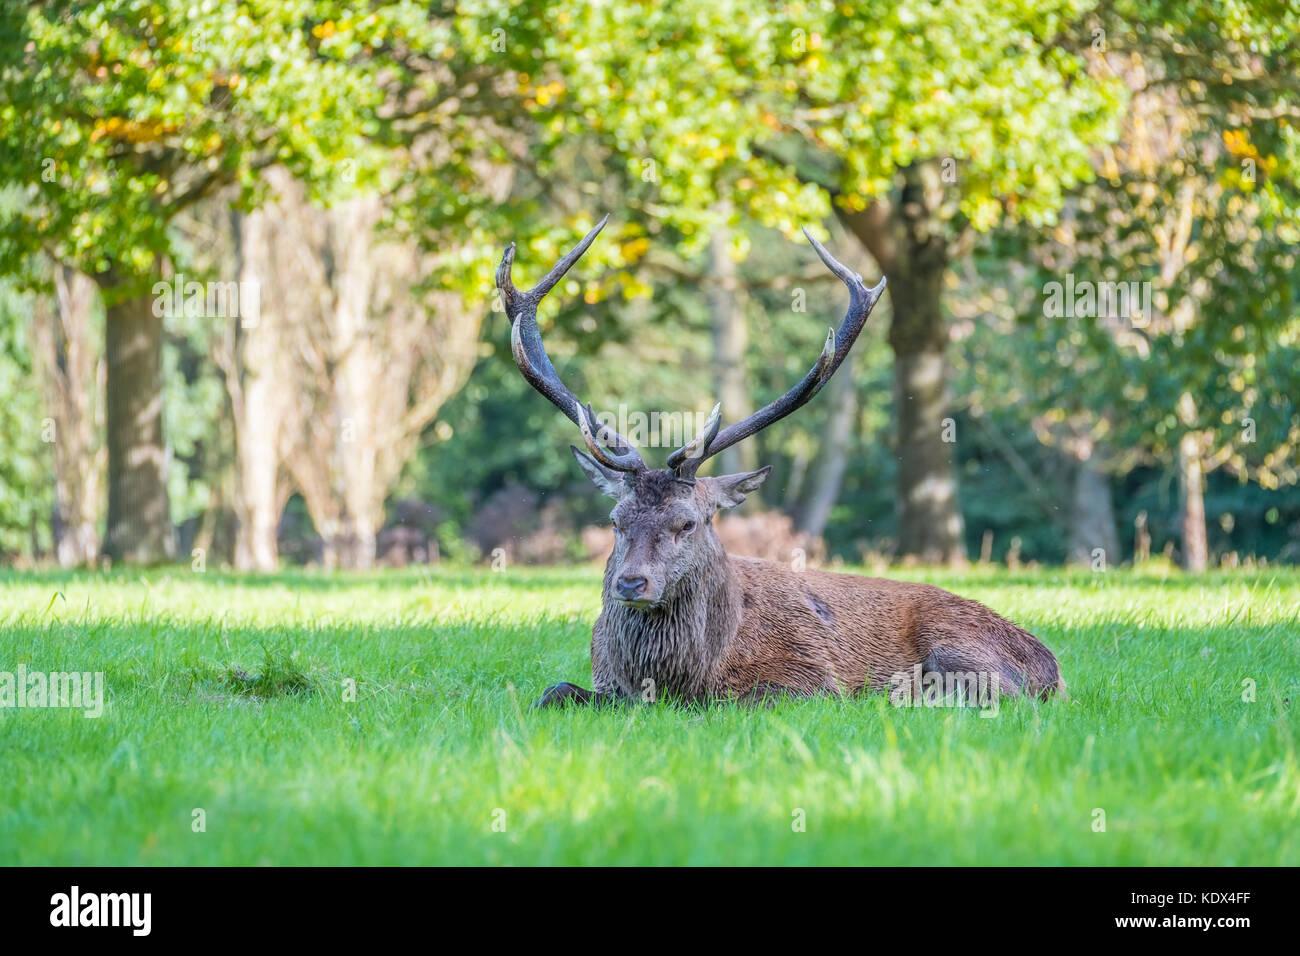 Injured Red Deer Stag - Stock Image